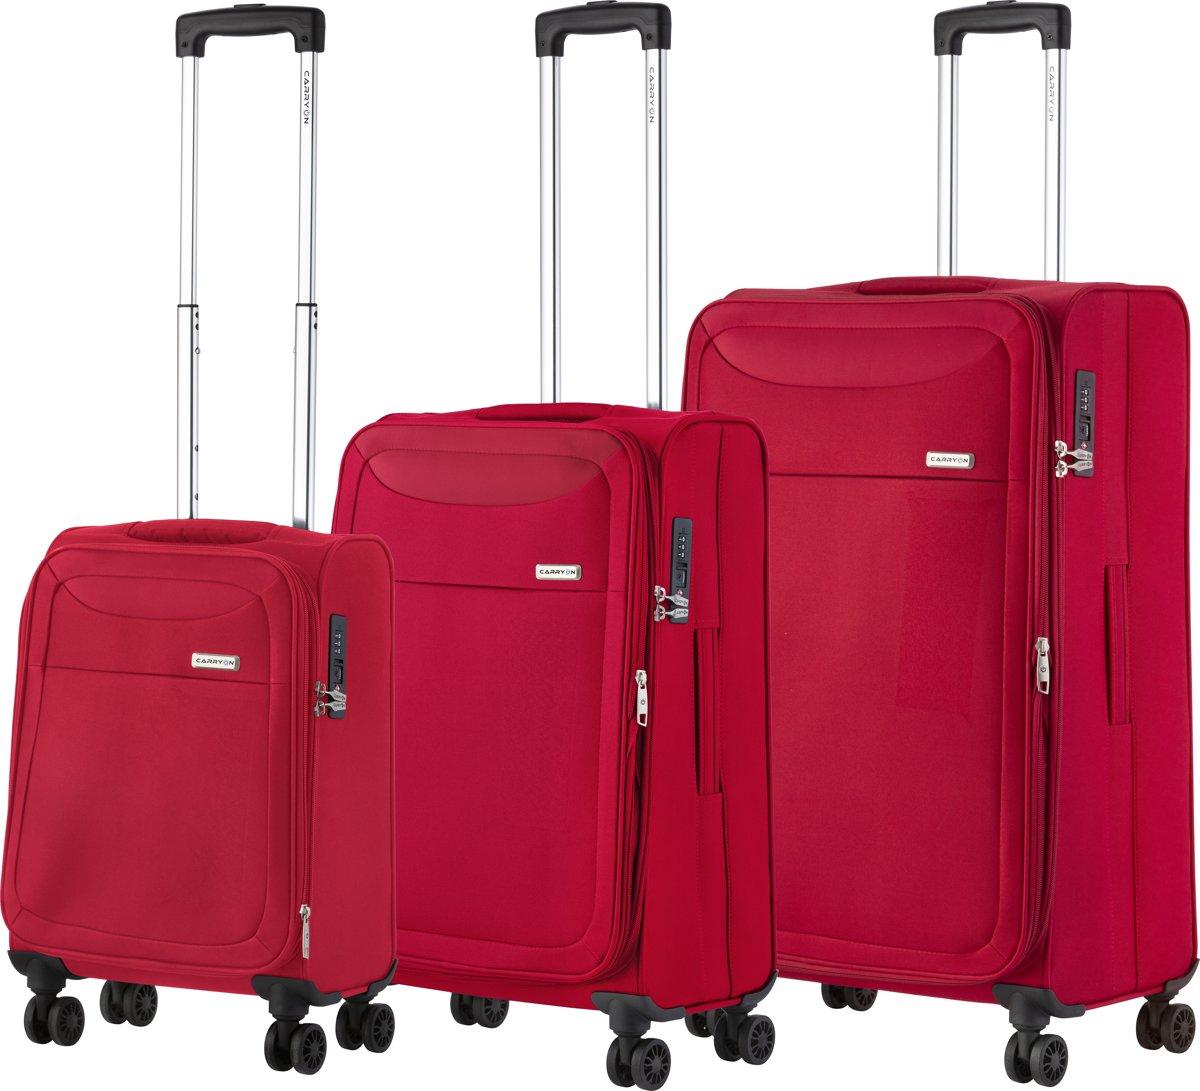 CarryOn Air - Kofferset met wielen - 3 delige trolleyset met TSA-cijferslot - 5 jaar garantie en anti-diefstal rits - Rood kopen